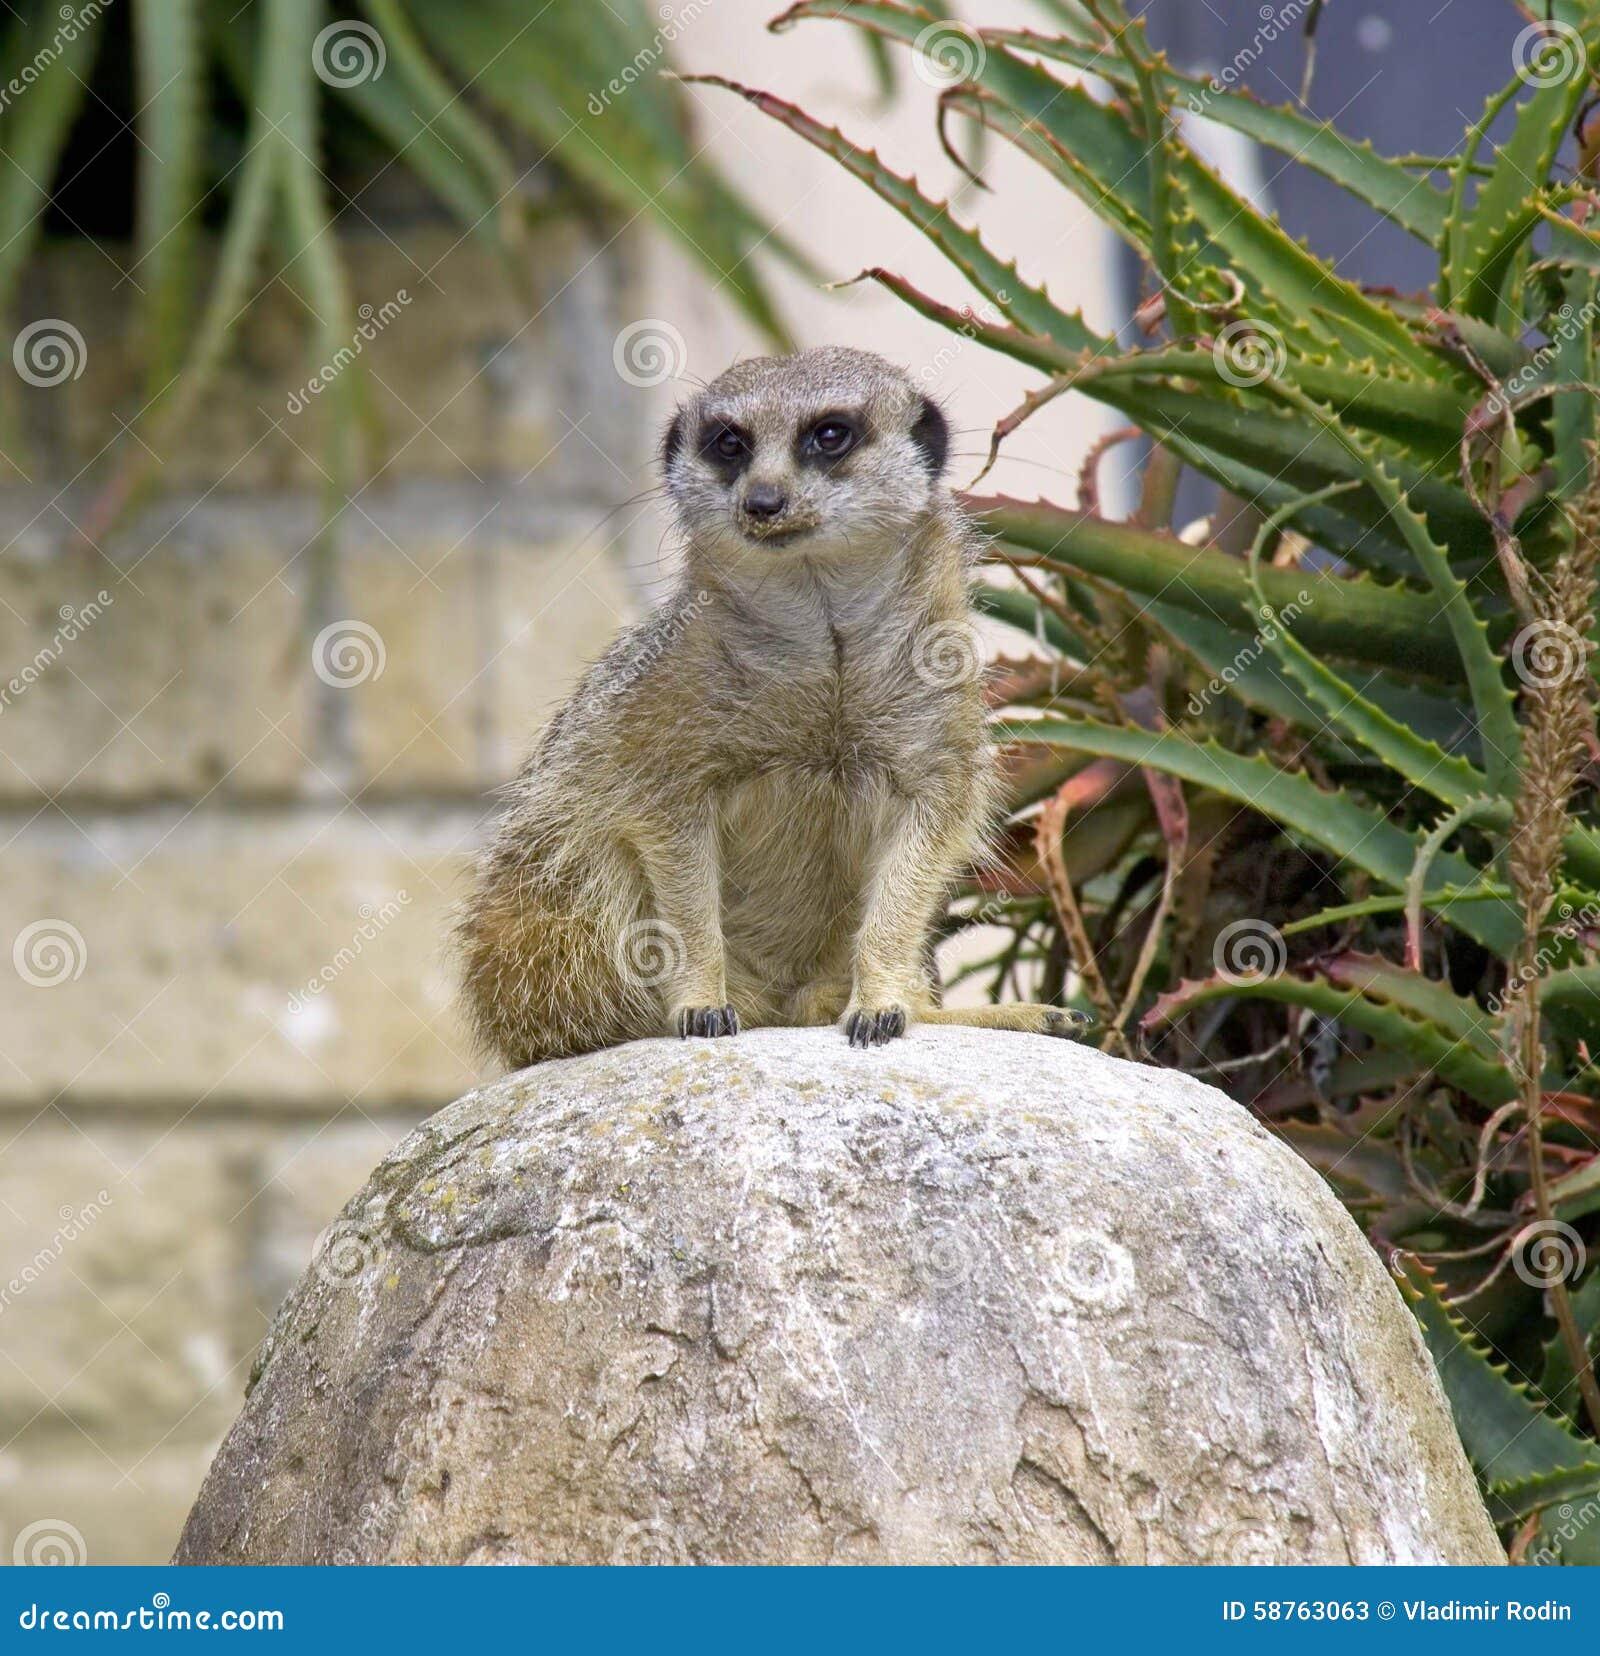 Meerkats: WhoZoo